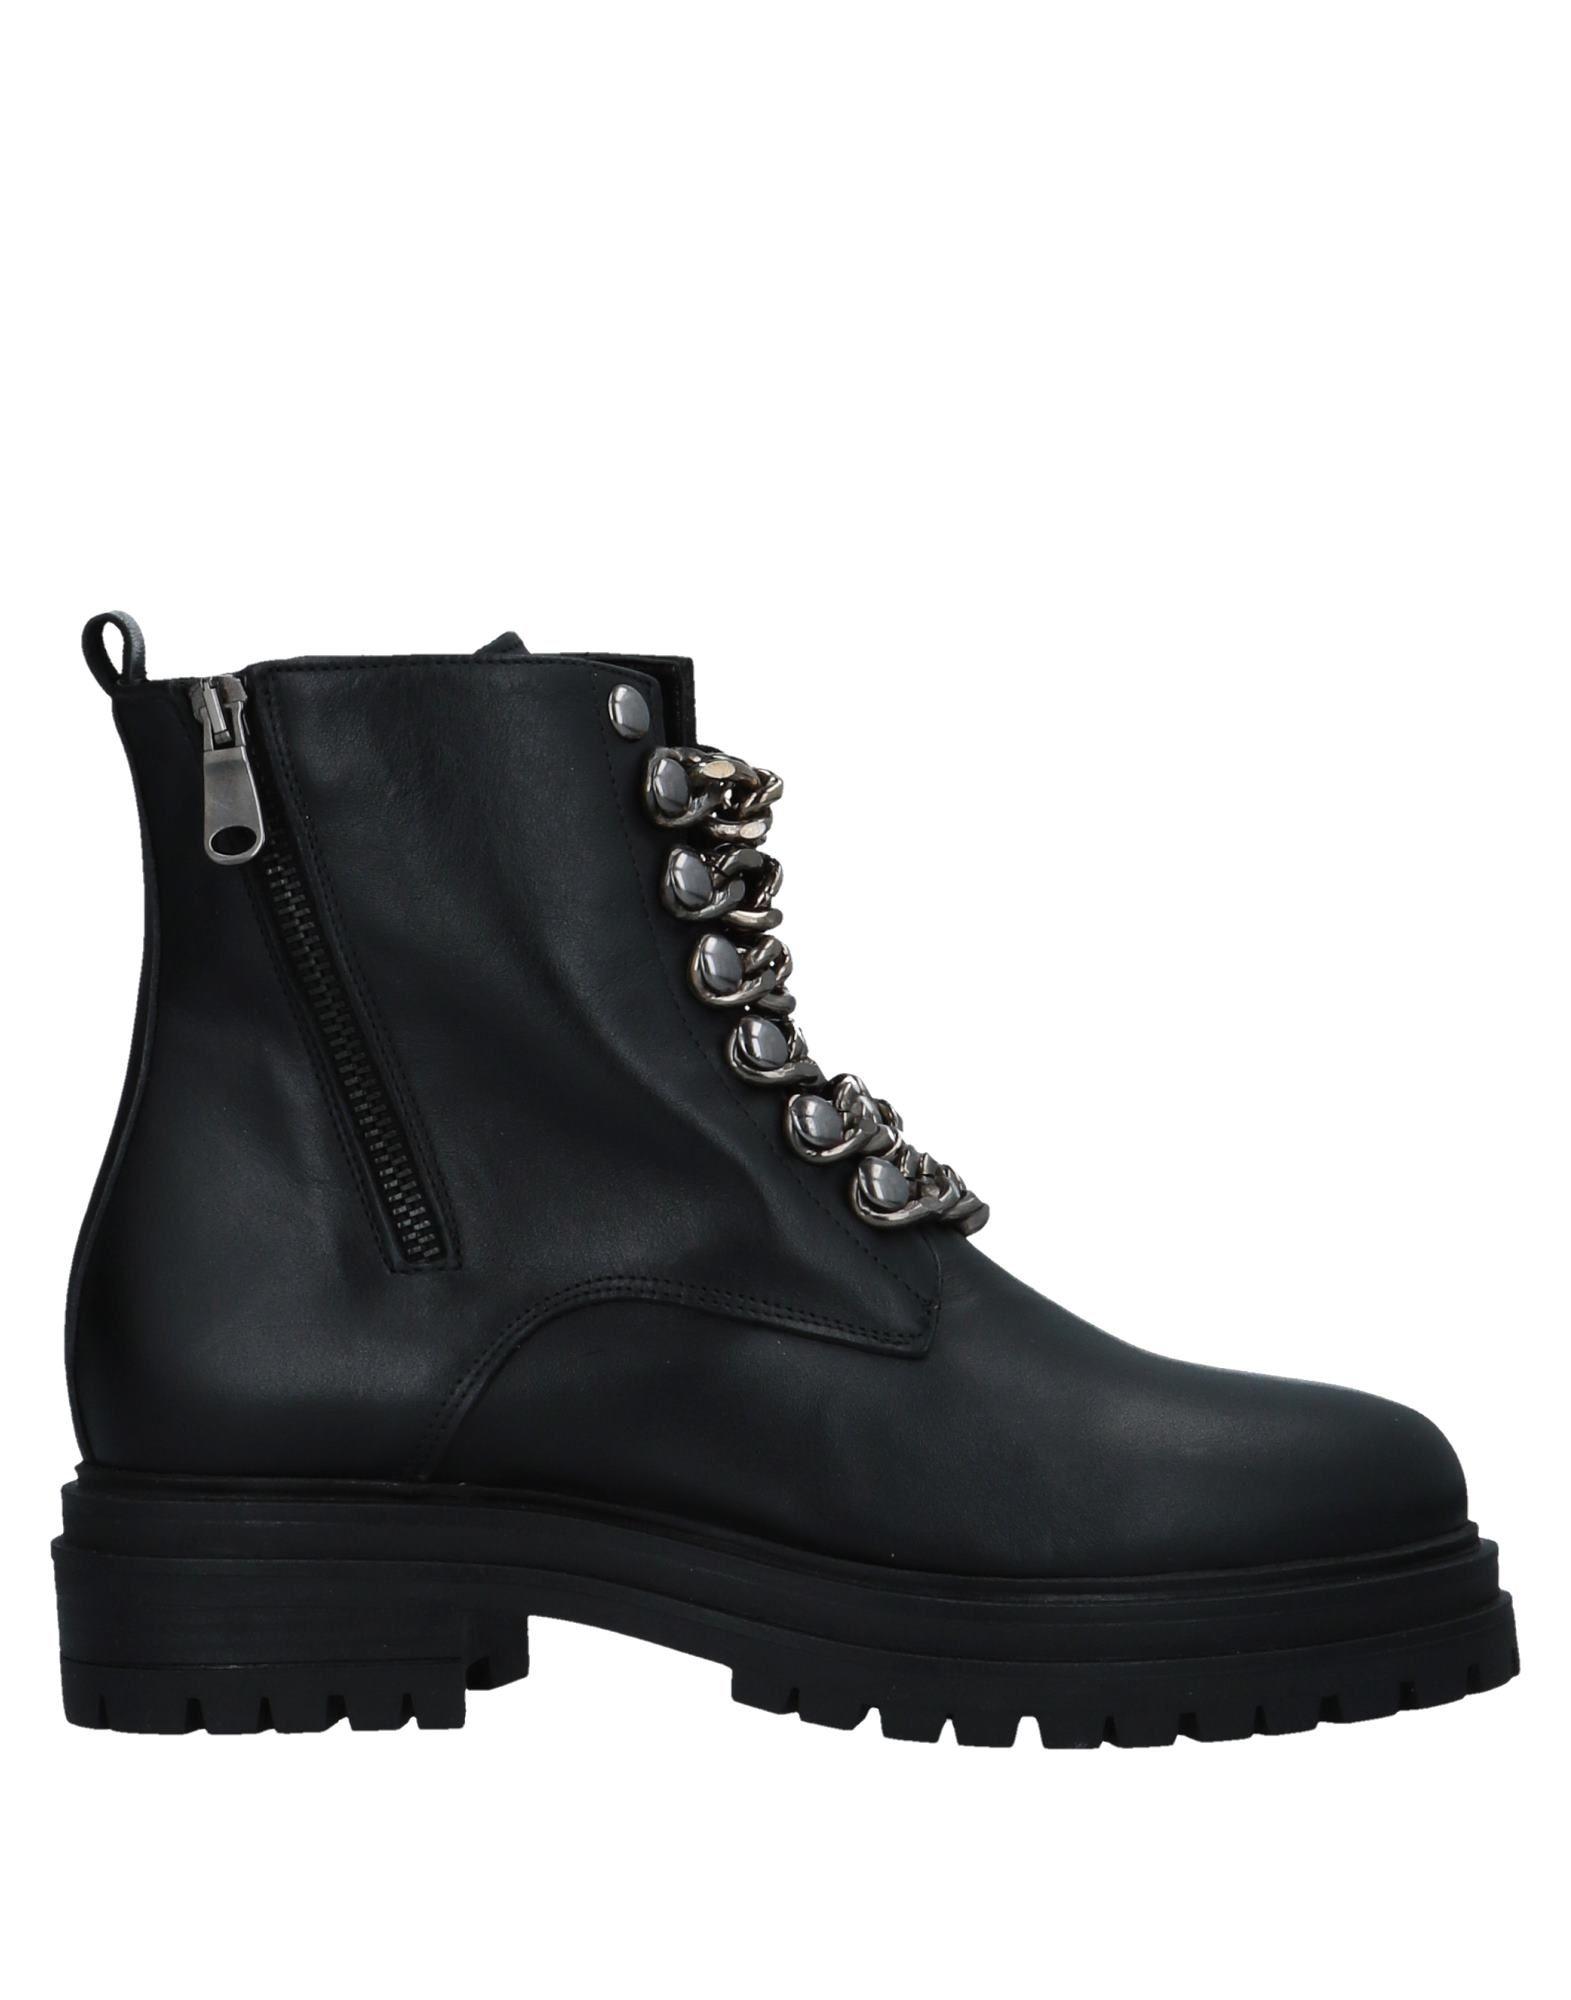 J.Born Ankle Boot - Women J.Born  Ankle Boots online on  J.Born United Kingdom - 11532920TT 1fa381